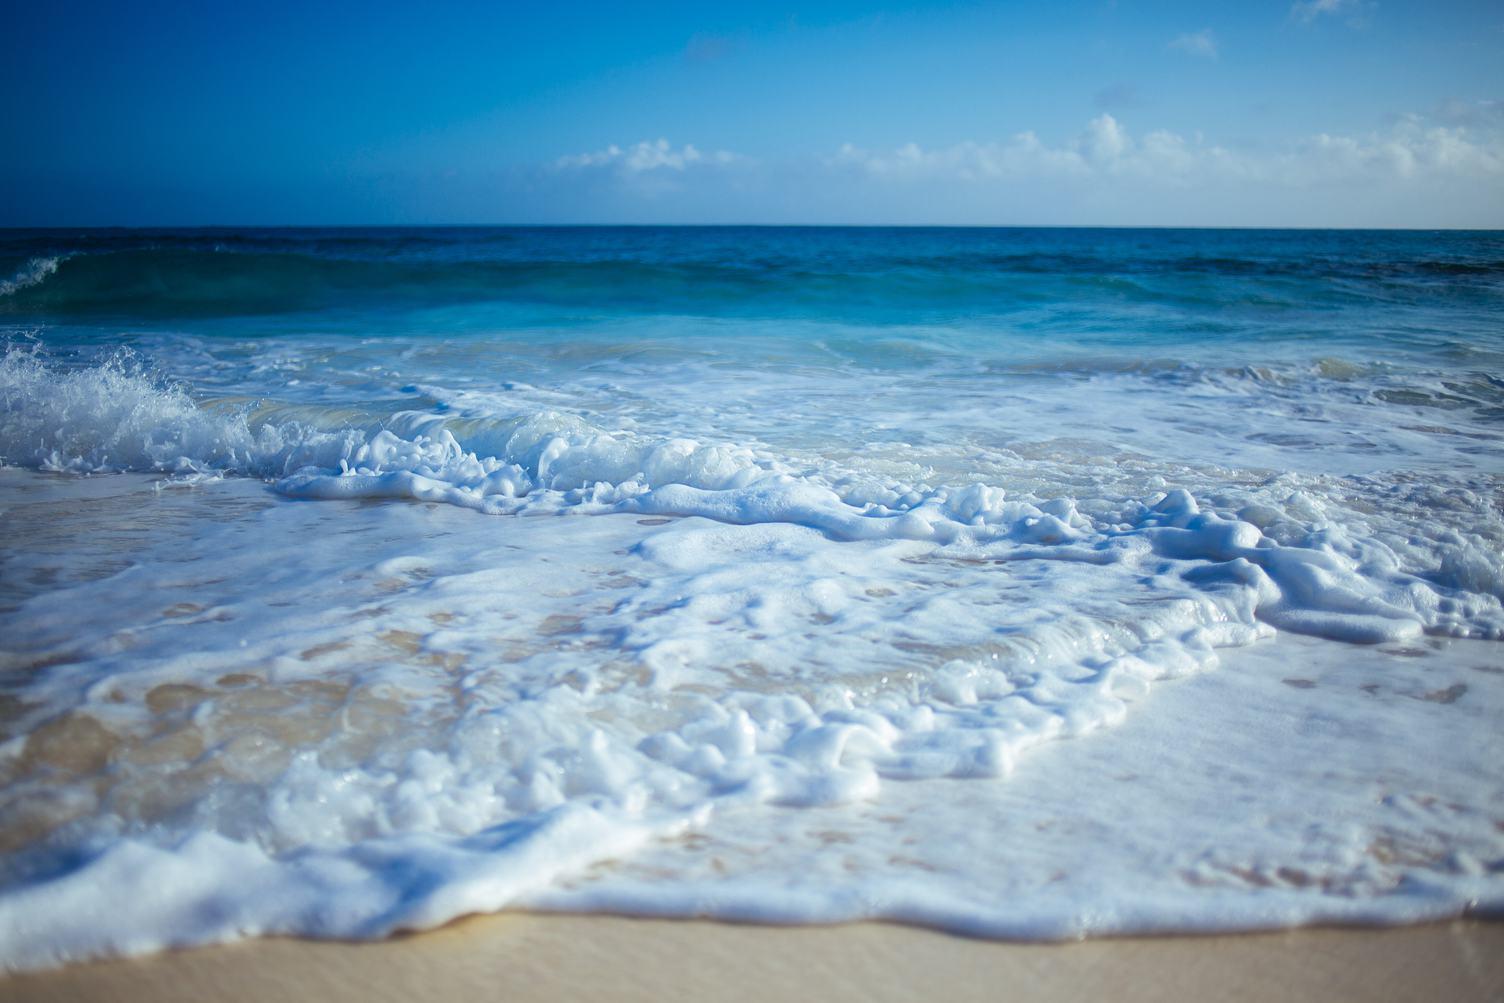 Ocean Waves Closeup of Clear Blue Water